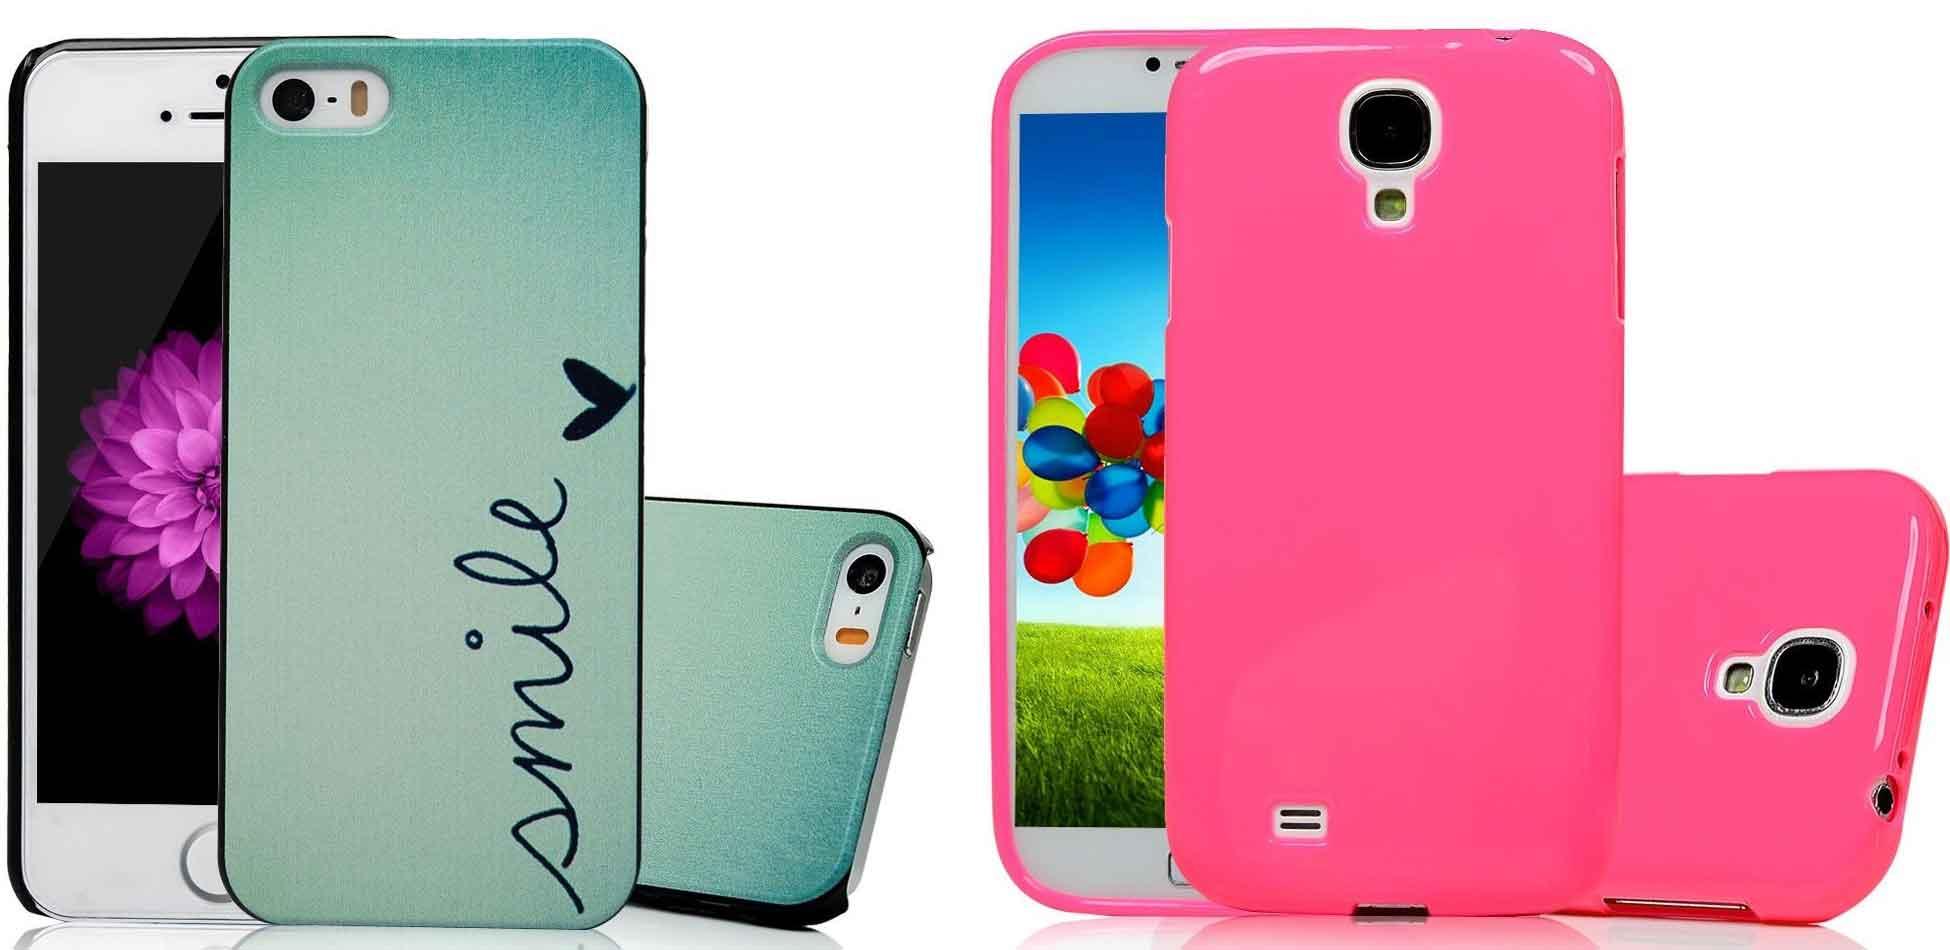 Iphone 5 & Samsung S4 mini Hülle @Amazon Prime 3,99€